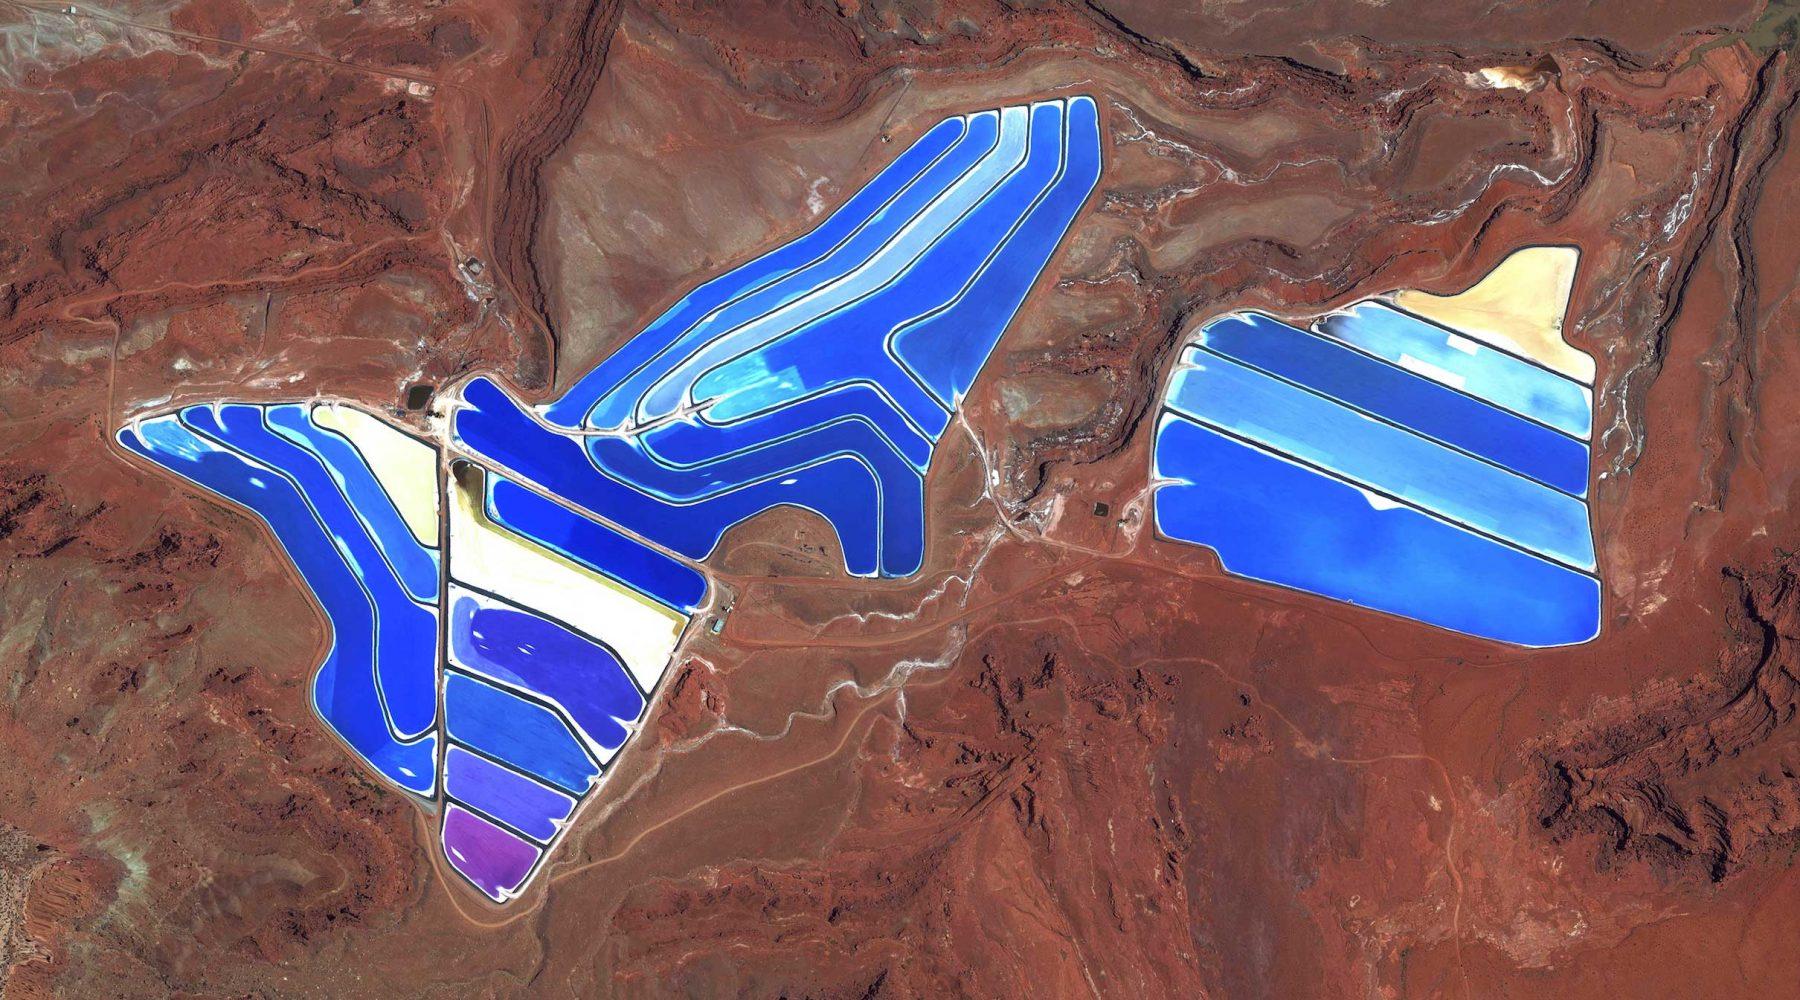 Intrepid Potash Mine Satellite Photo